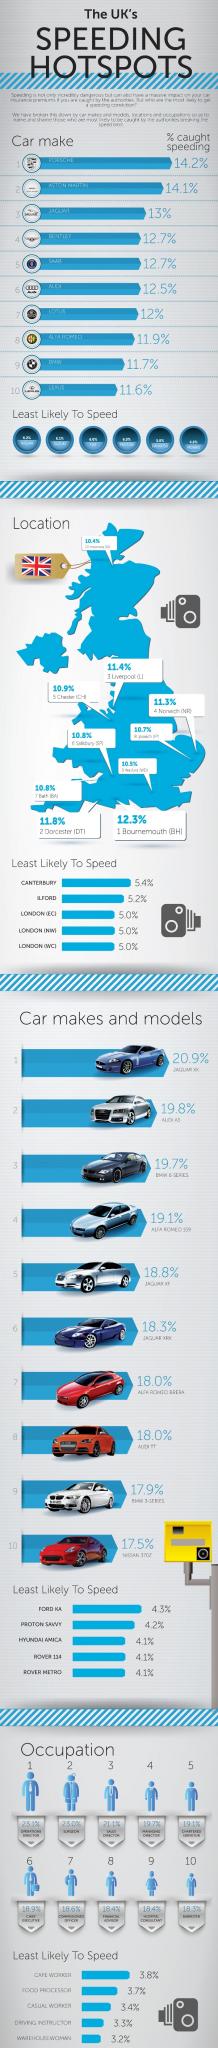 Speeding Infographic UK.png